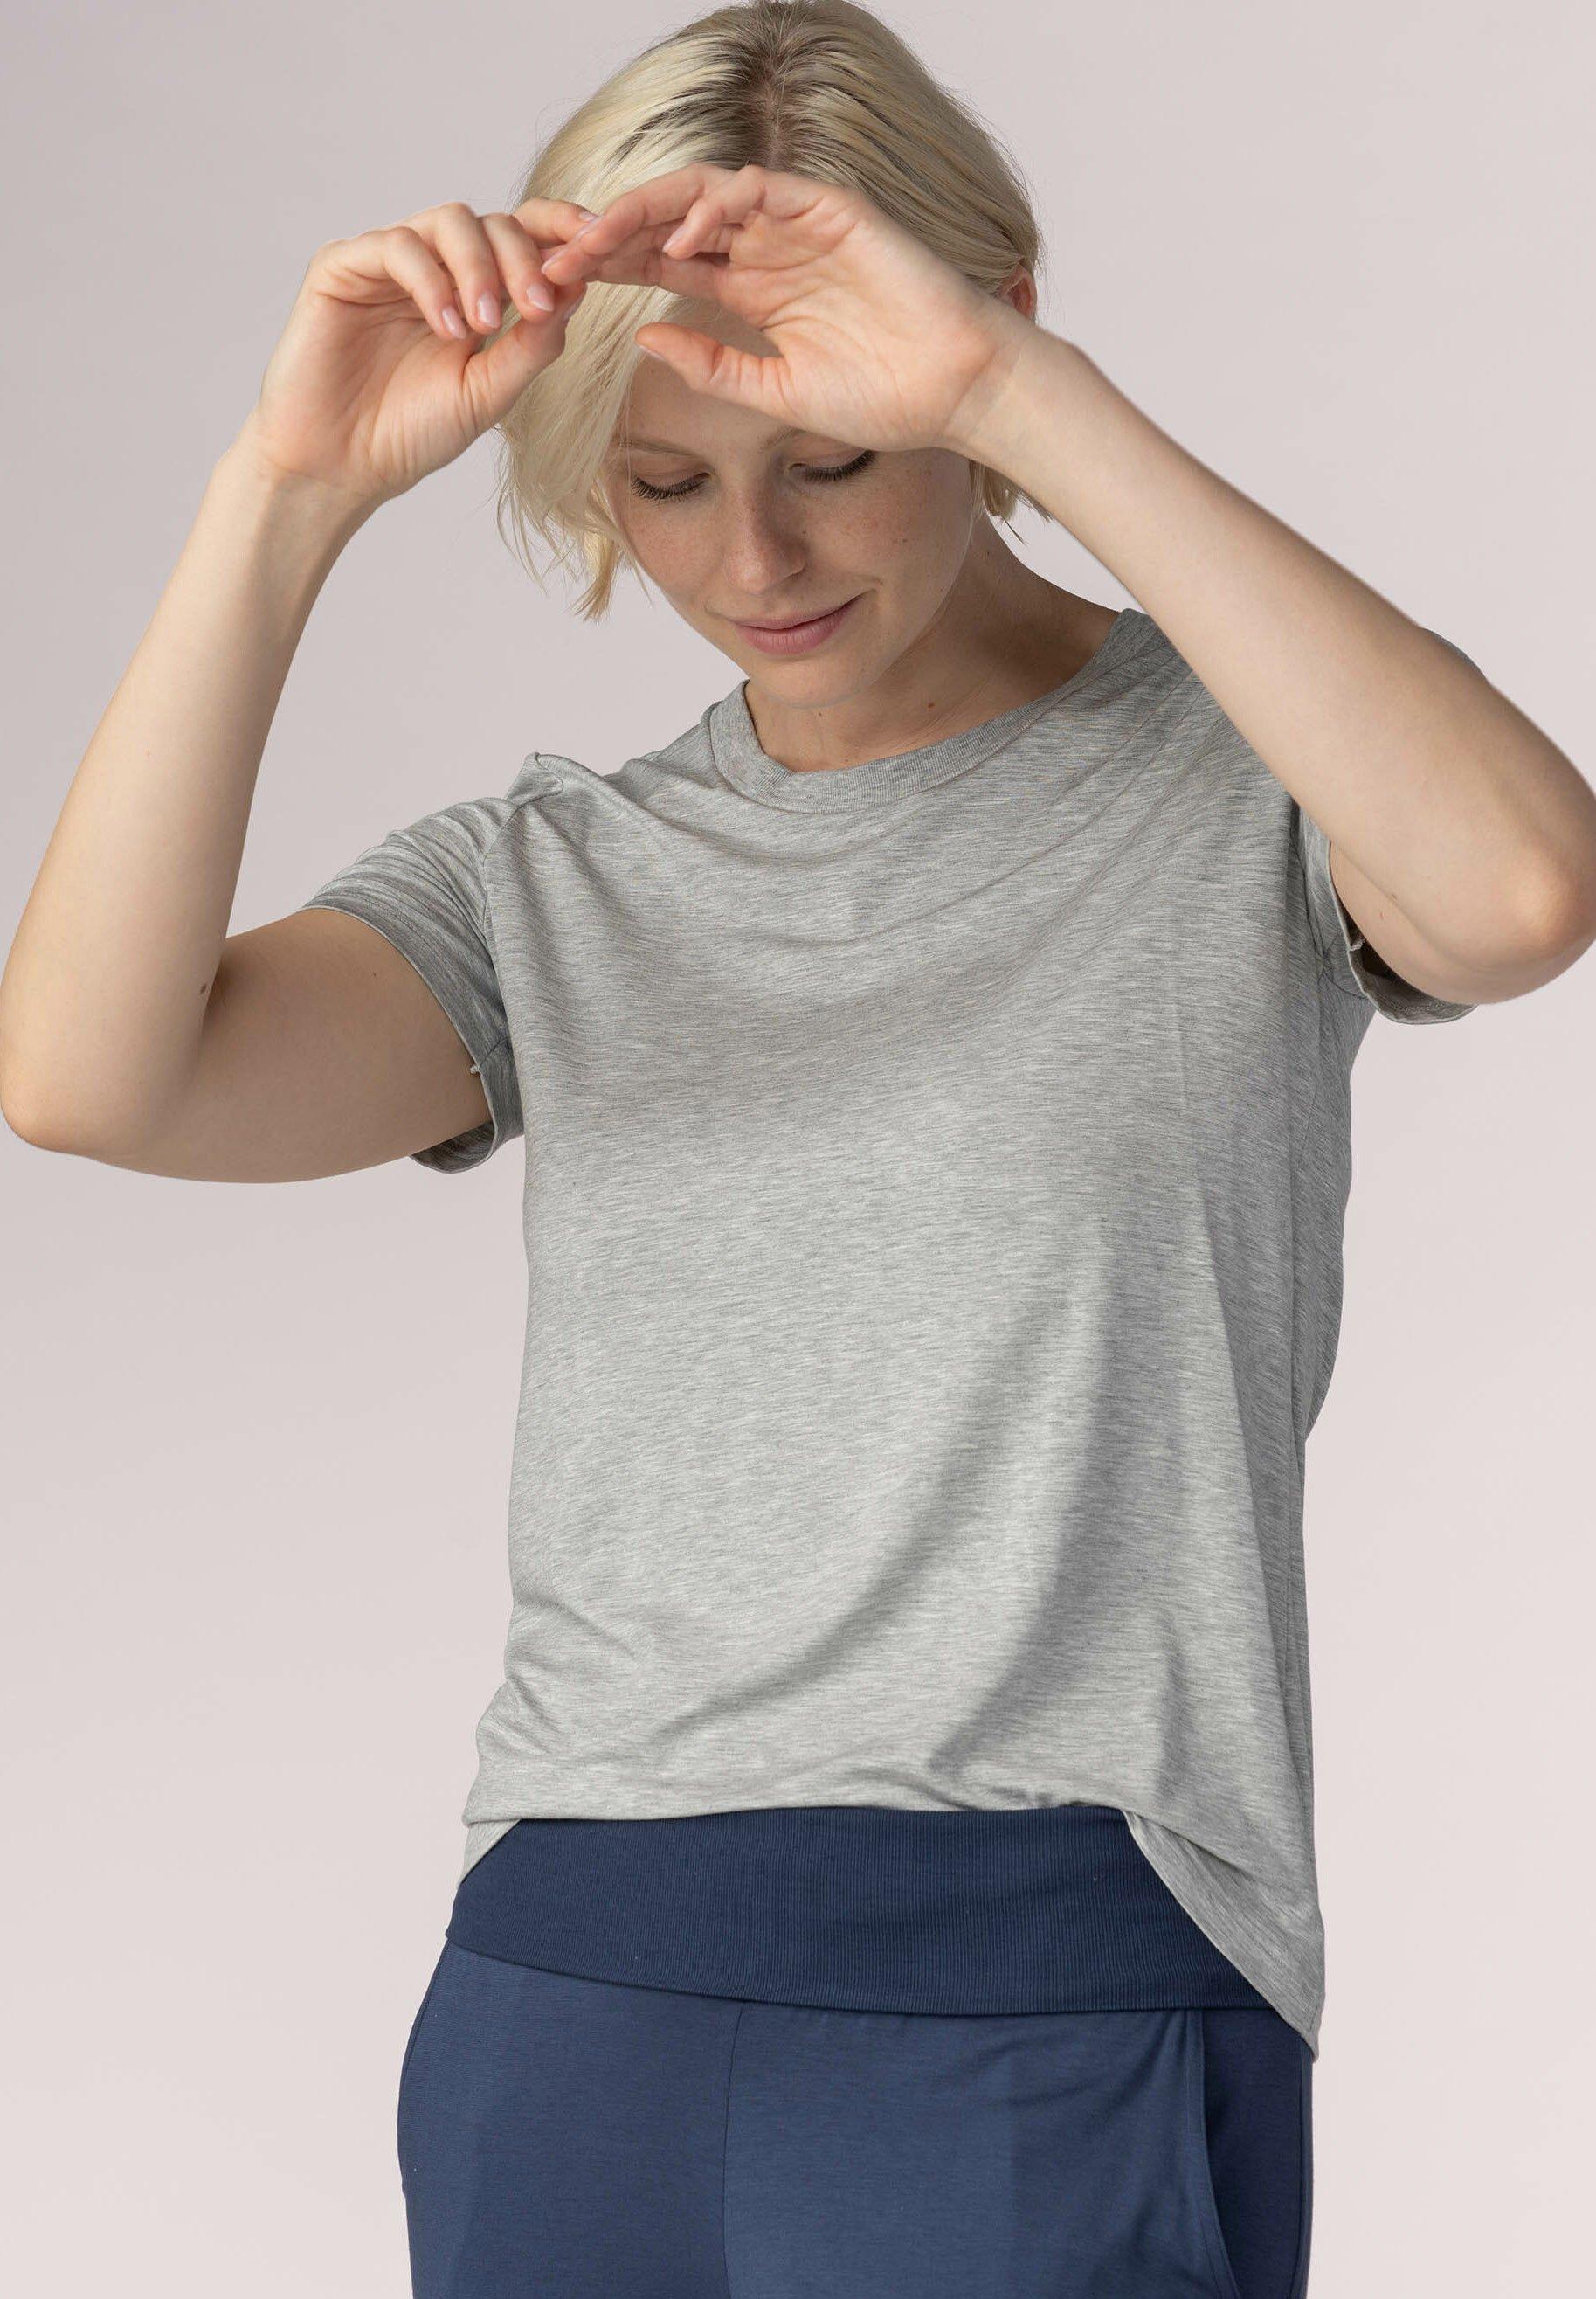 Damen NACHTWÄSCHE SHIRT SERIE SLEEPY&EASY - Unterhemd/-shirt